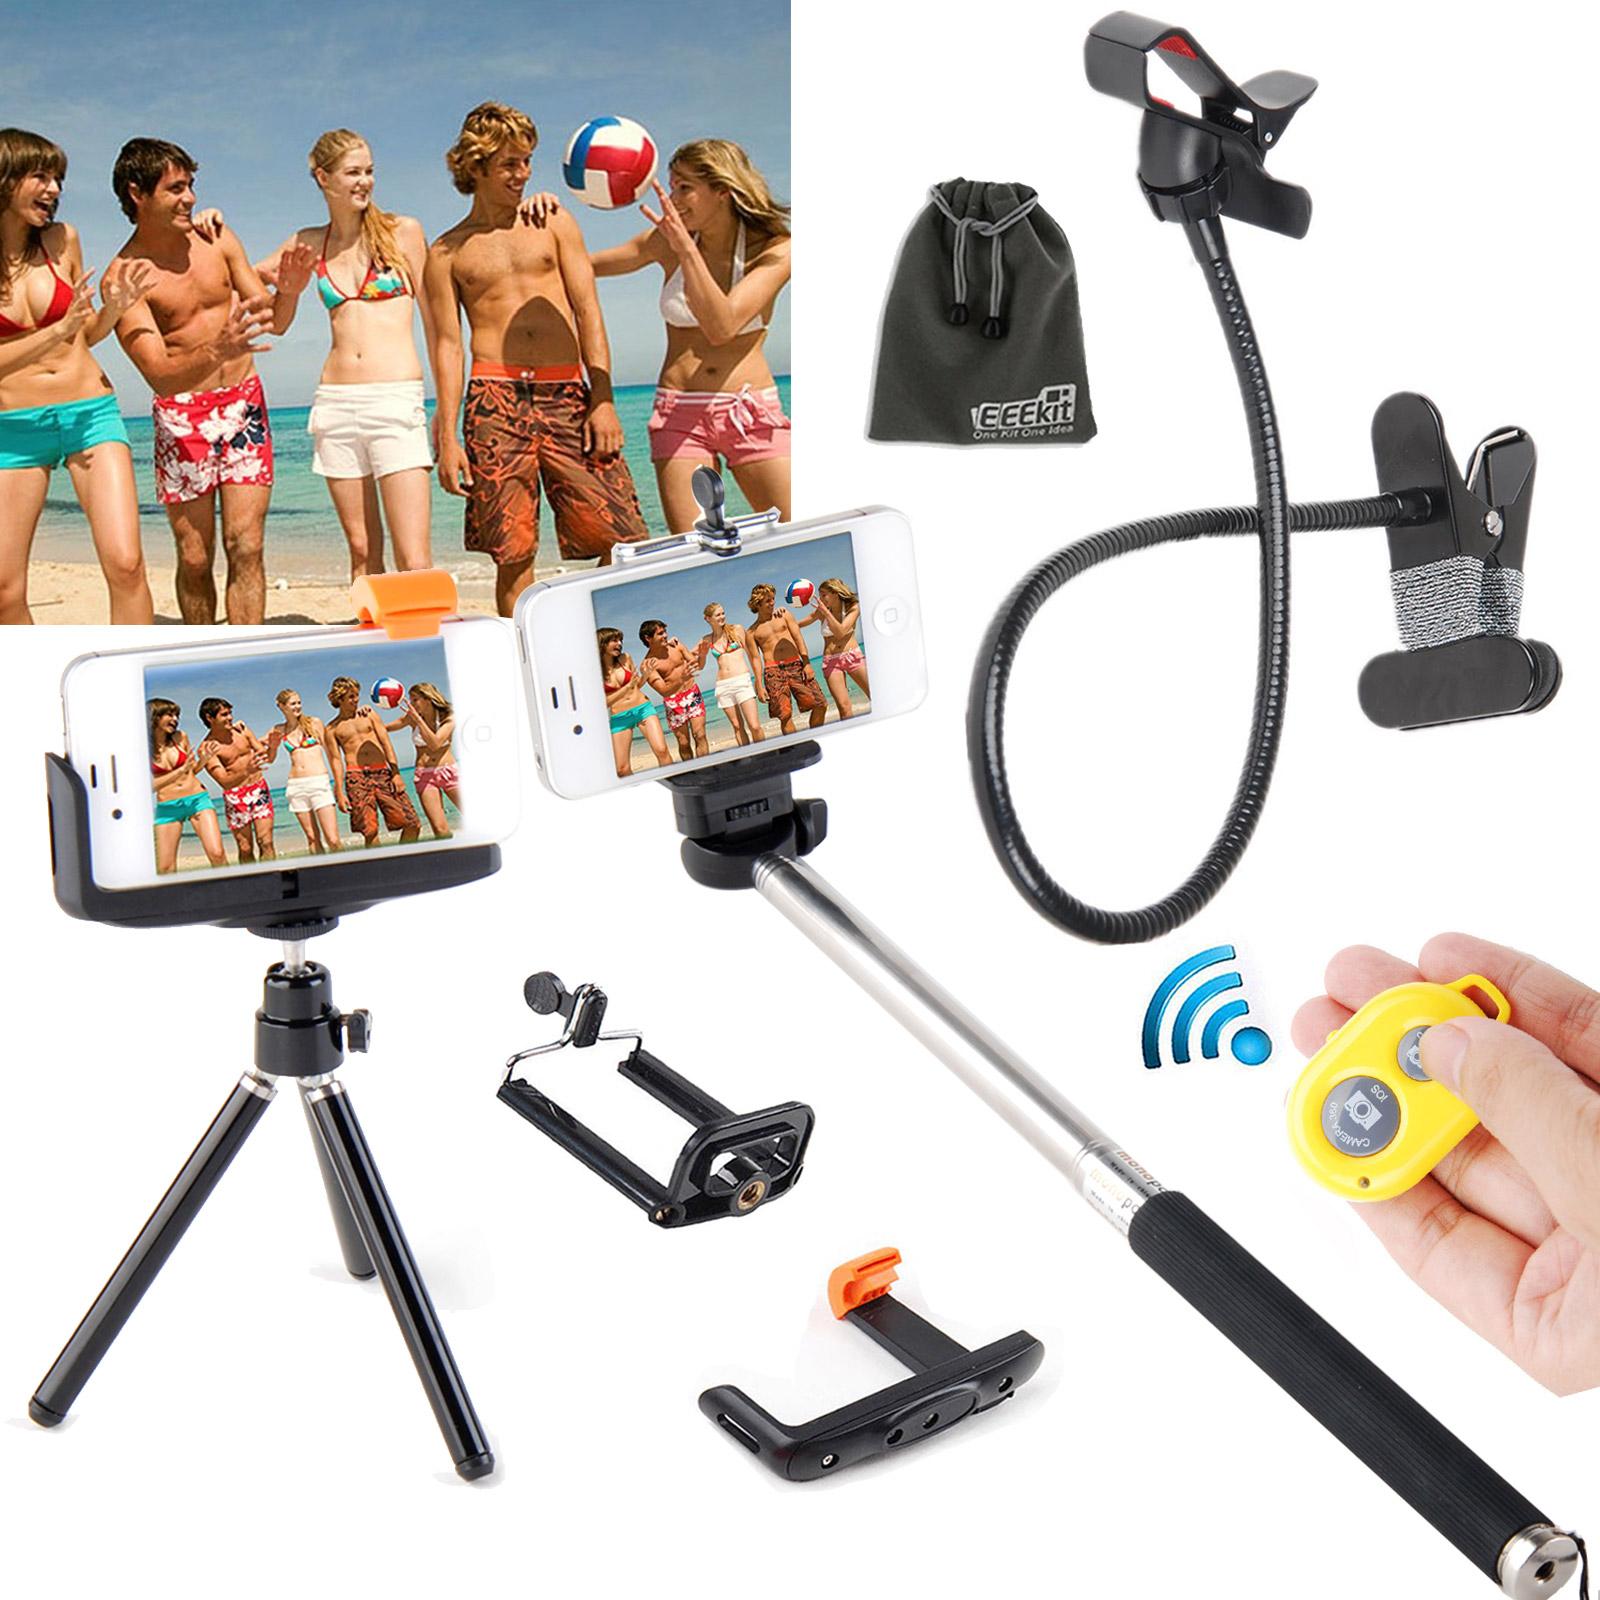 EEEKit for Phone Bluetooth Camera Remote Control+Monopod/Tripod+Desktop Holder at Sears.com